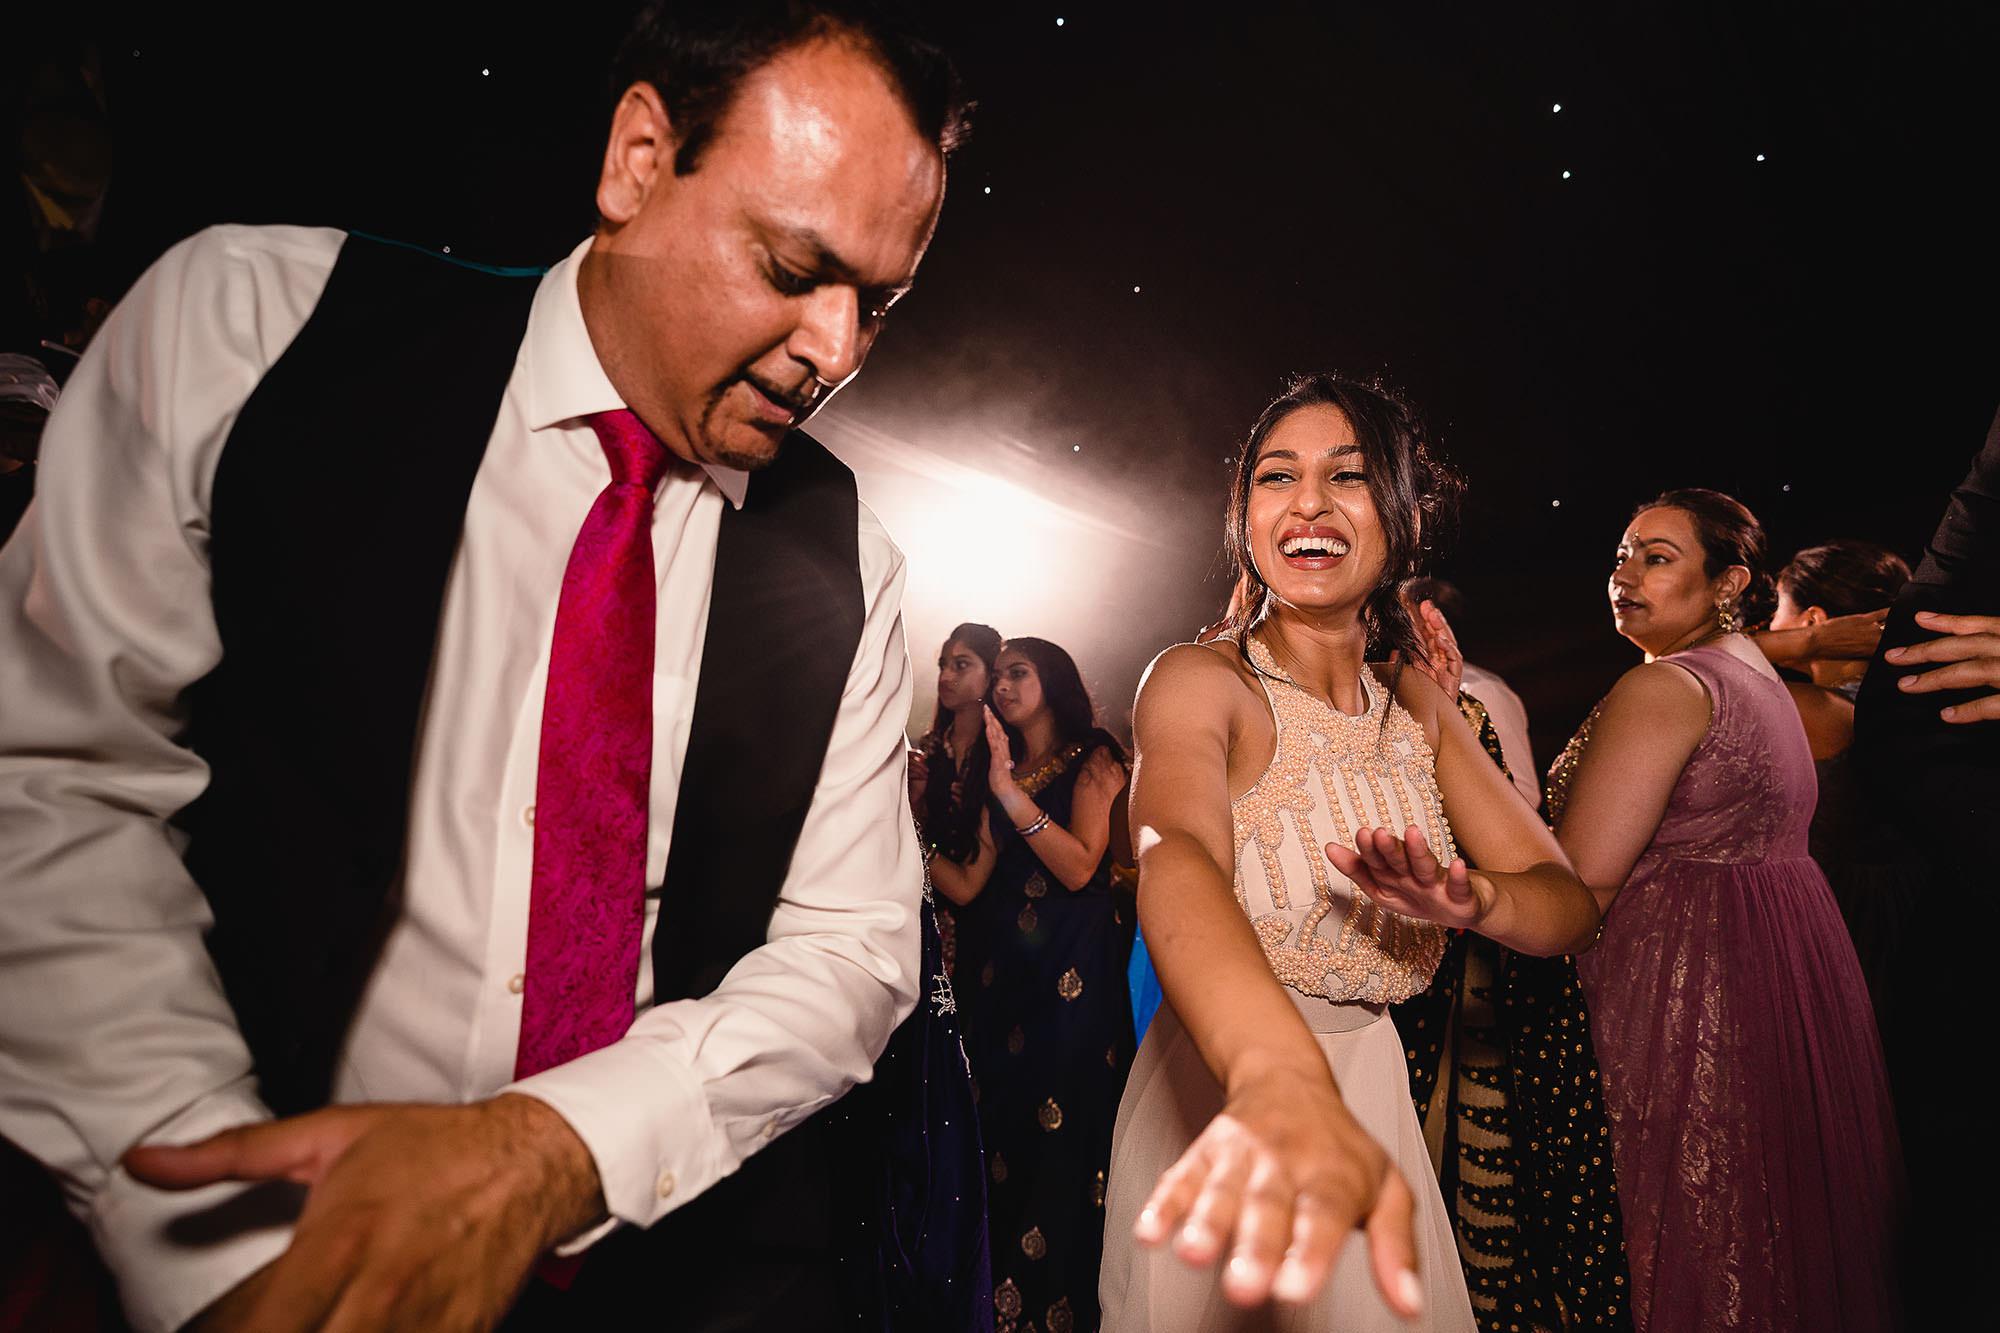 wedding guests enjoying themselves